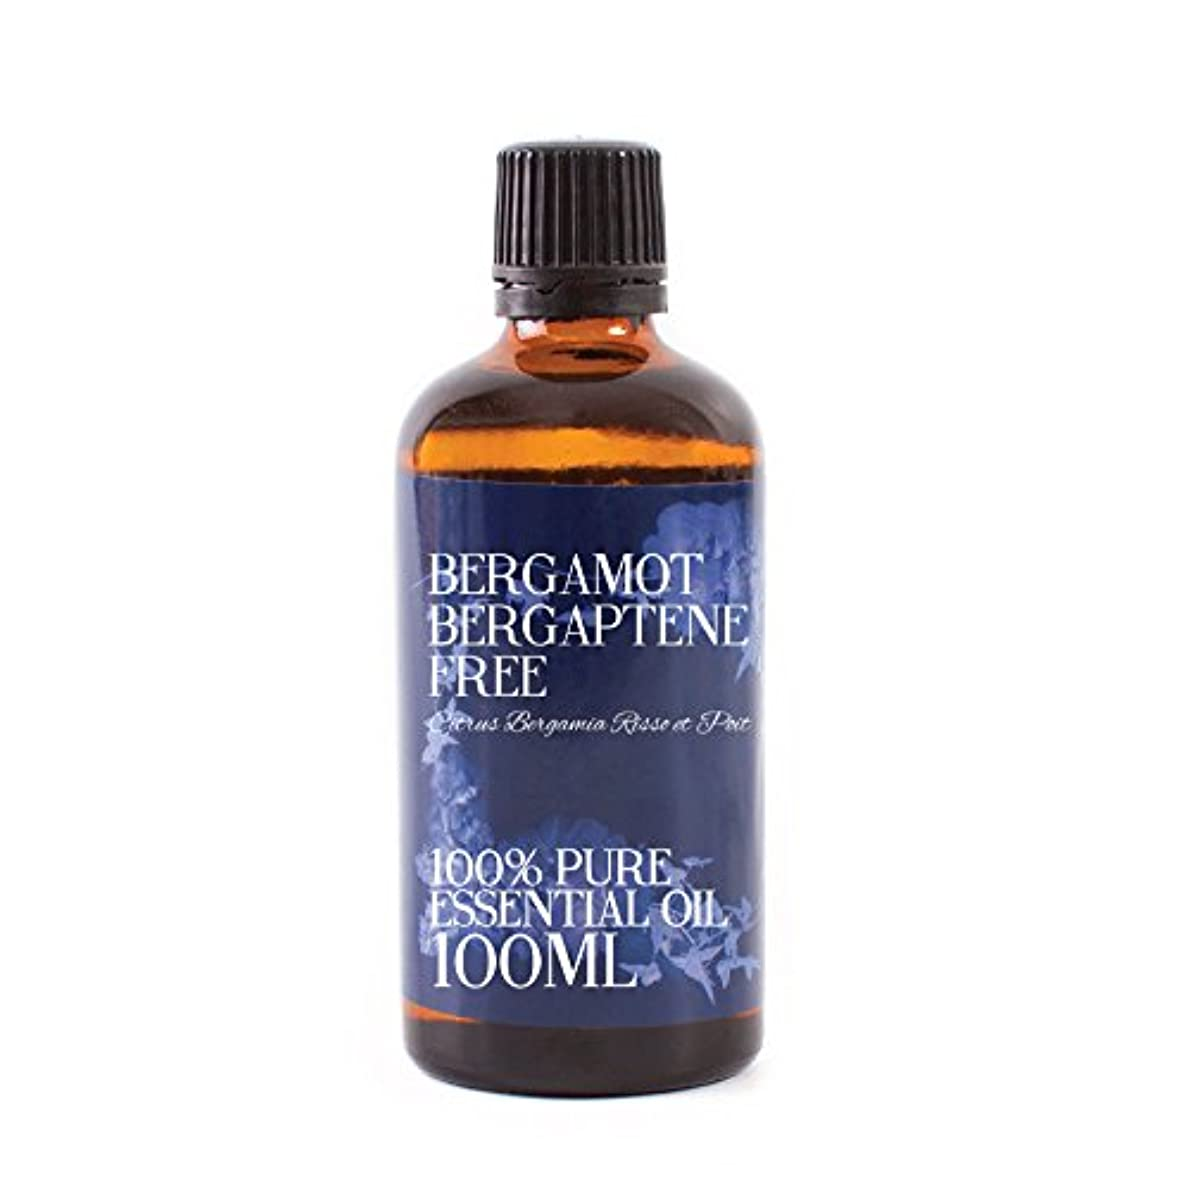 Mystic Moments | Bergamot Bergaptene Free Essential Oil - 100ml - 100% Pure